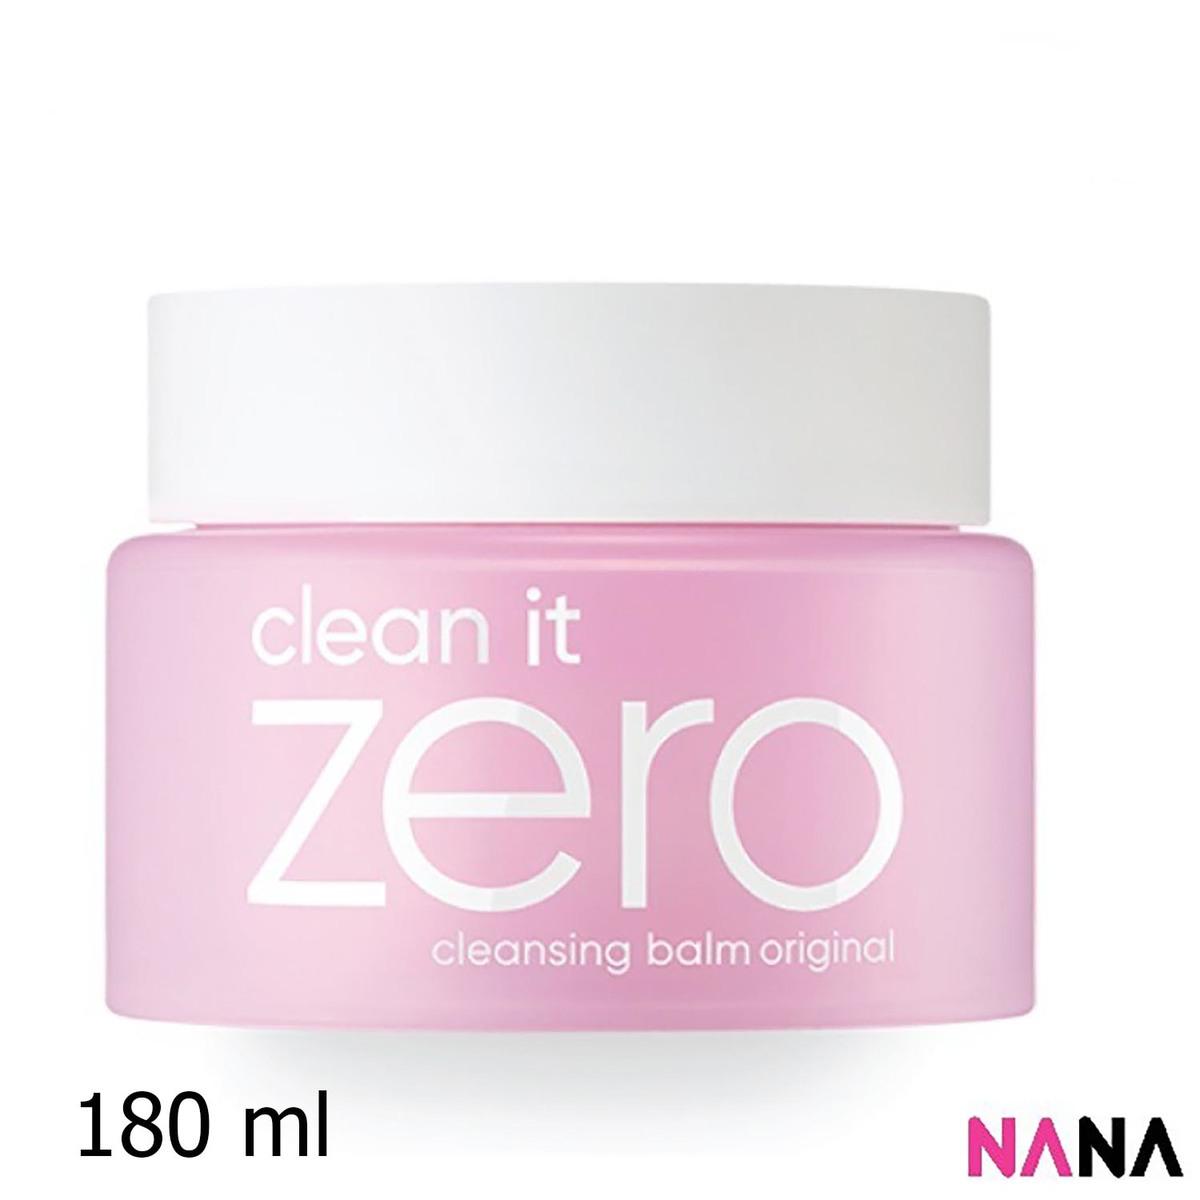 Clean It Zero 零殘留溫和緻柔卸妝膏 180ml [增量裝]